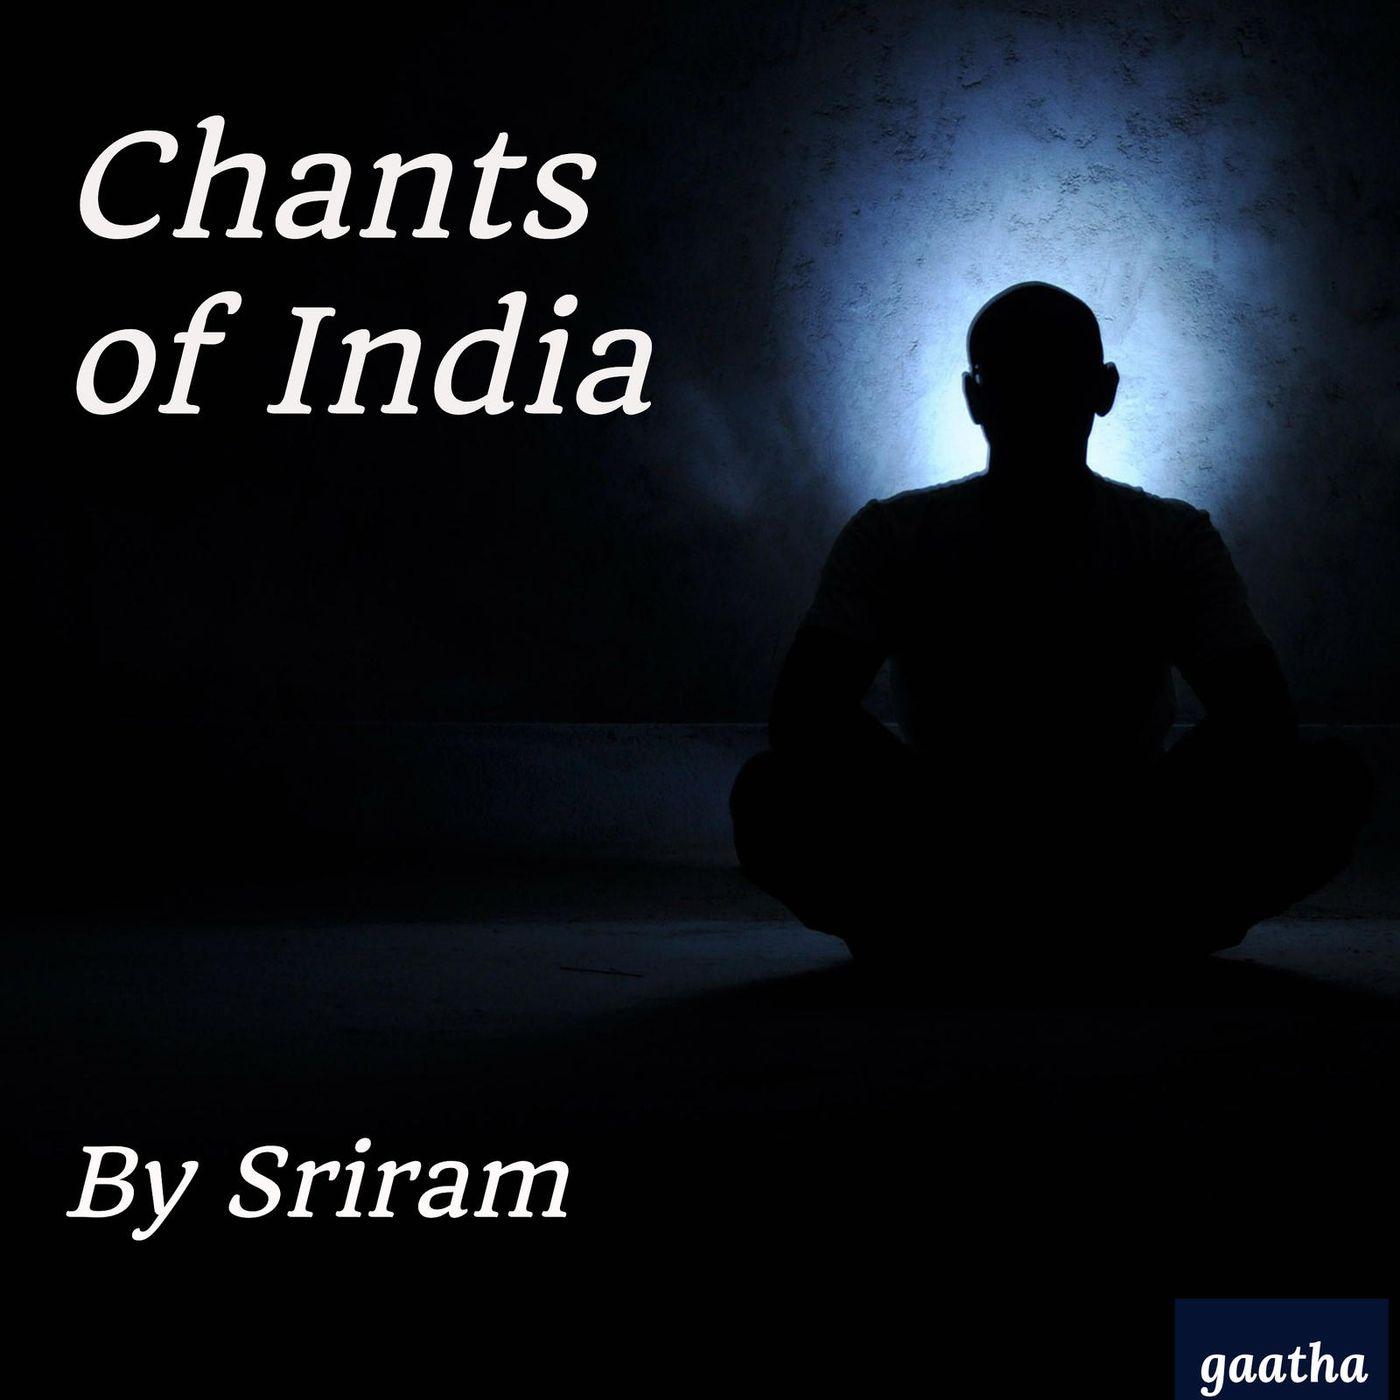 9. Chanting of Sri Suktam- Prayer of Gooddess Lakshmi